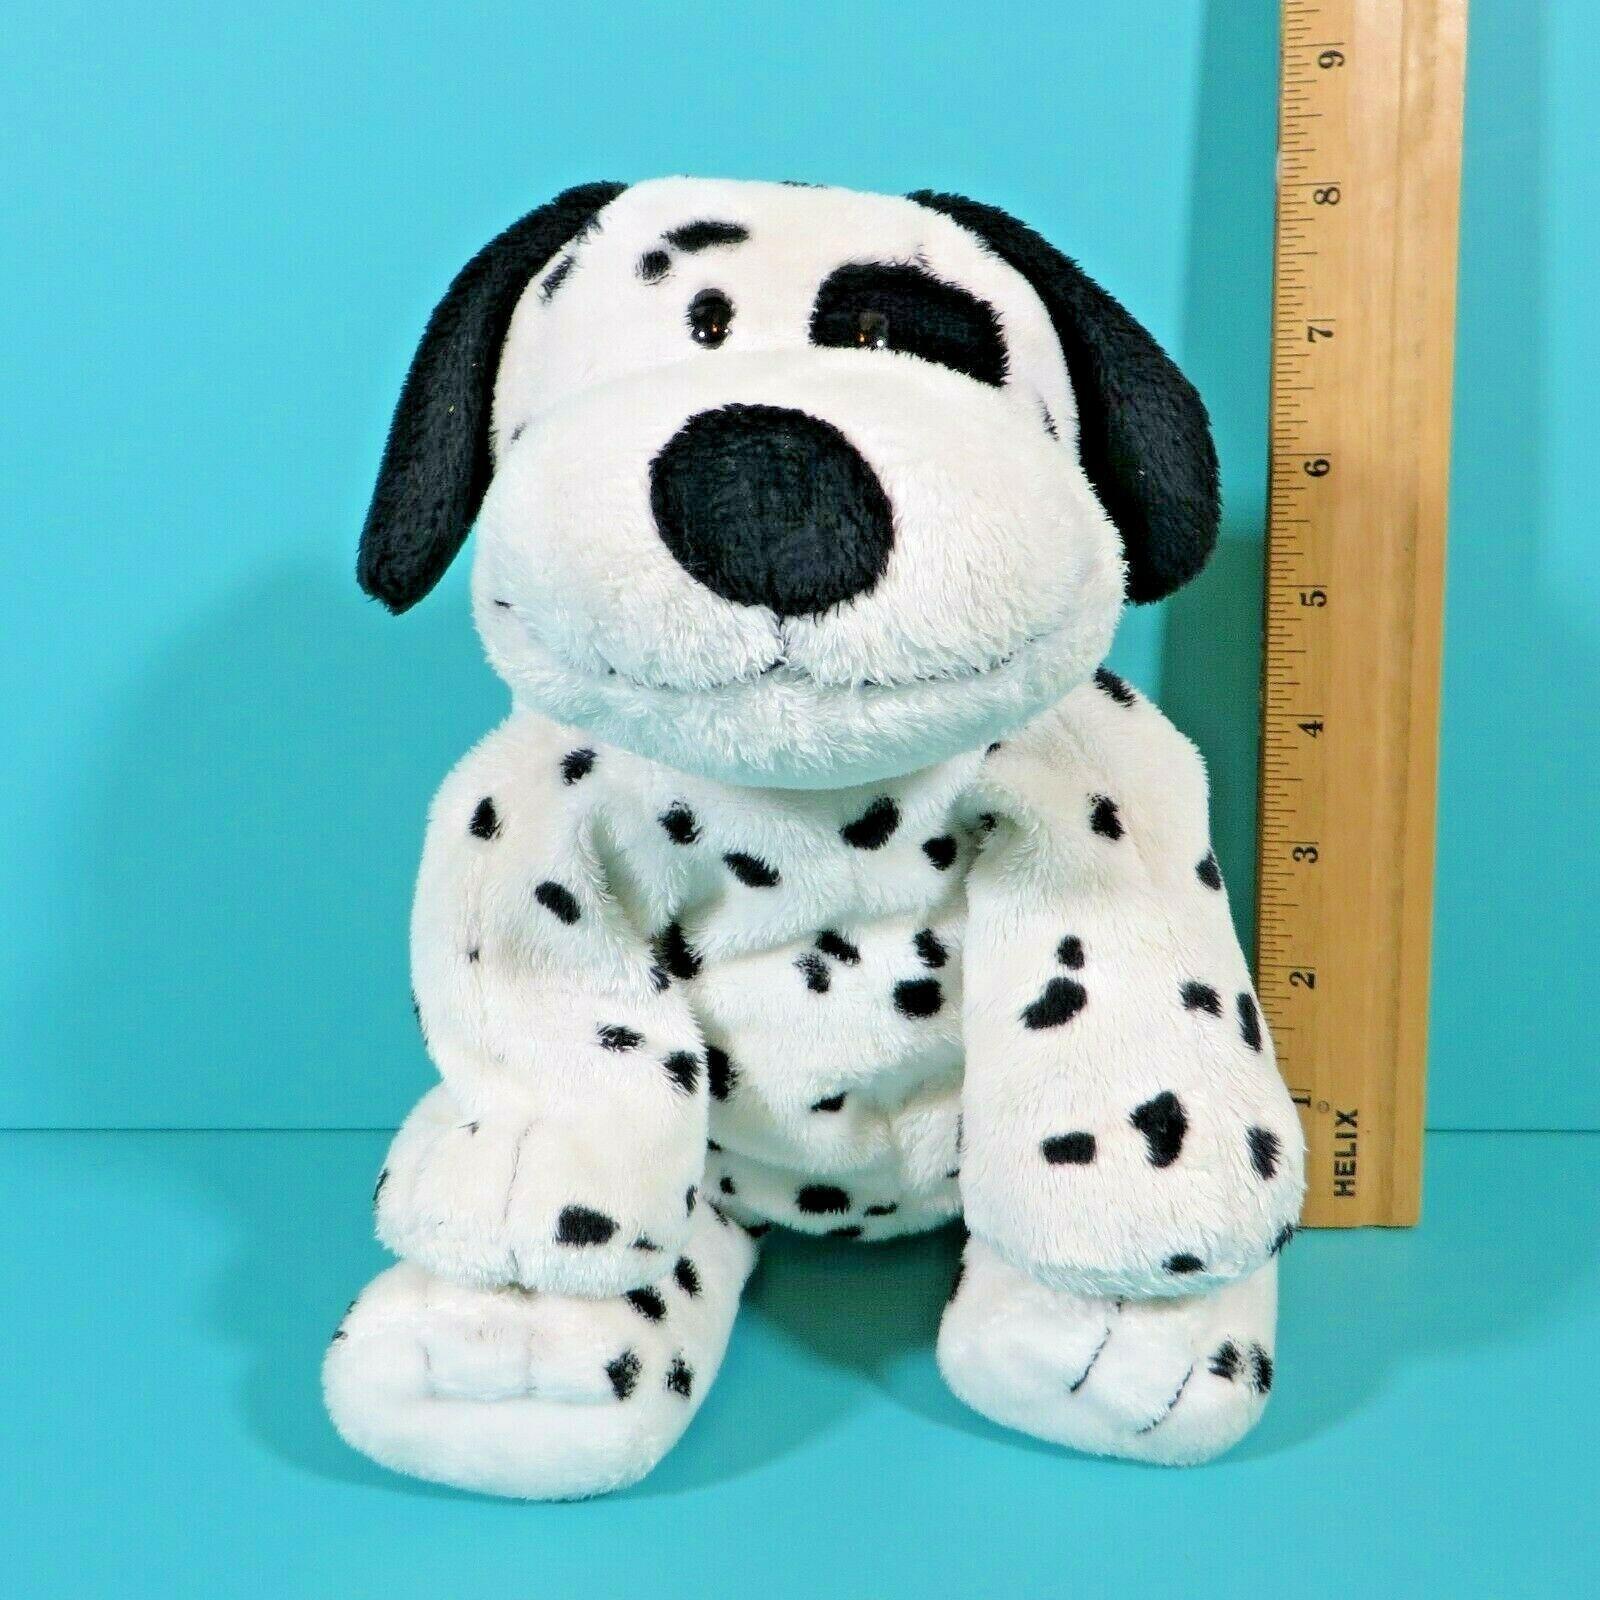 Ty Pluffies Dotters Dalmatian Puppy Dog Plush Spots Stuffed Animal Lovey 2009 - $19.95